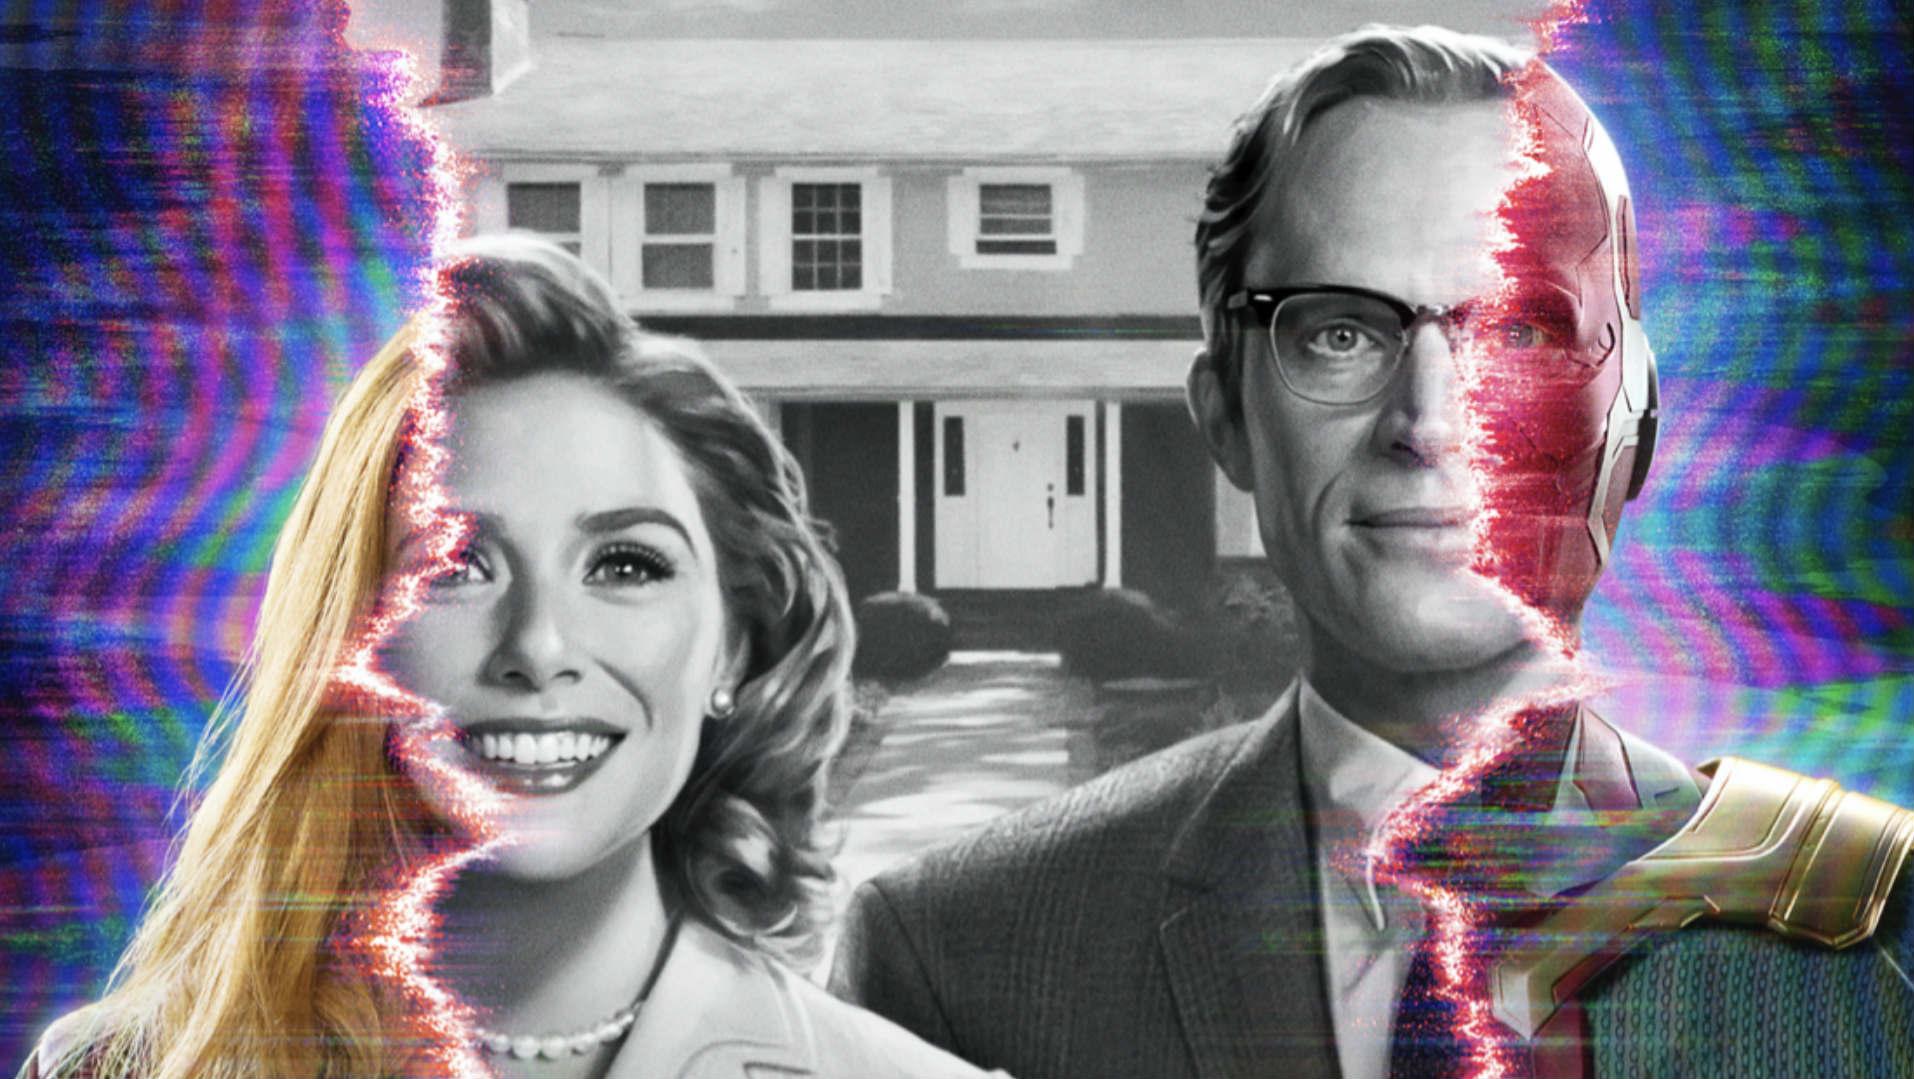 The Wonder of WandaVision TV Streaming Guide